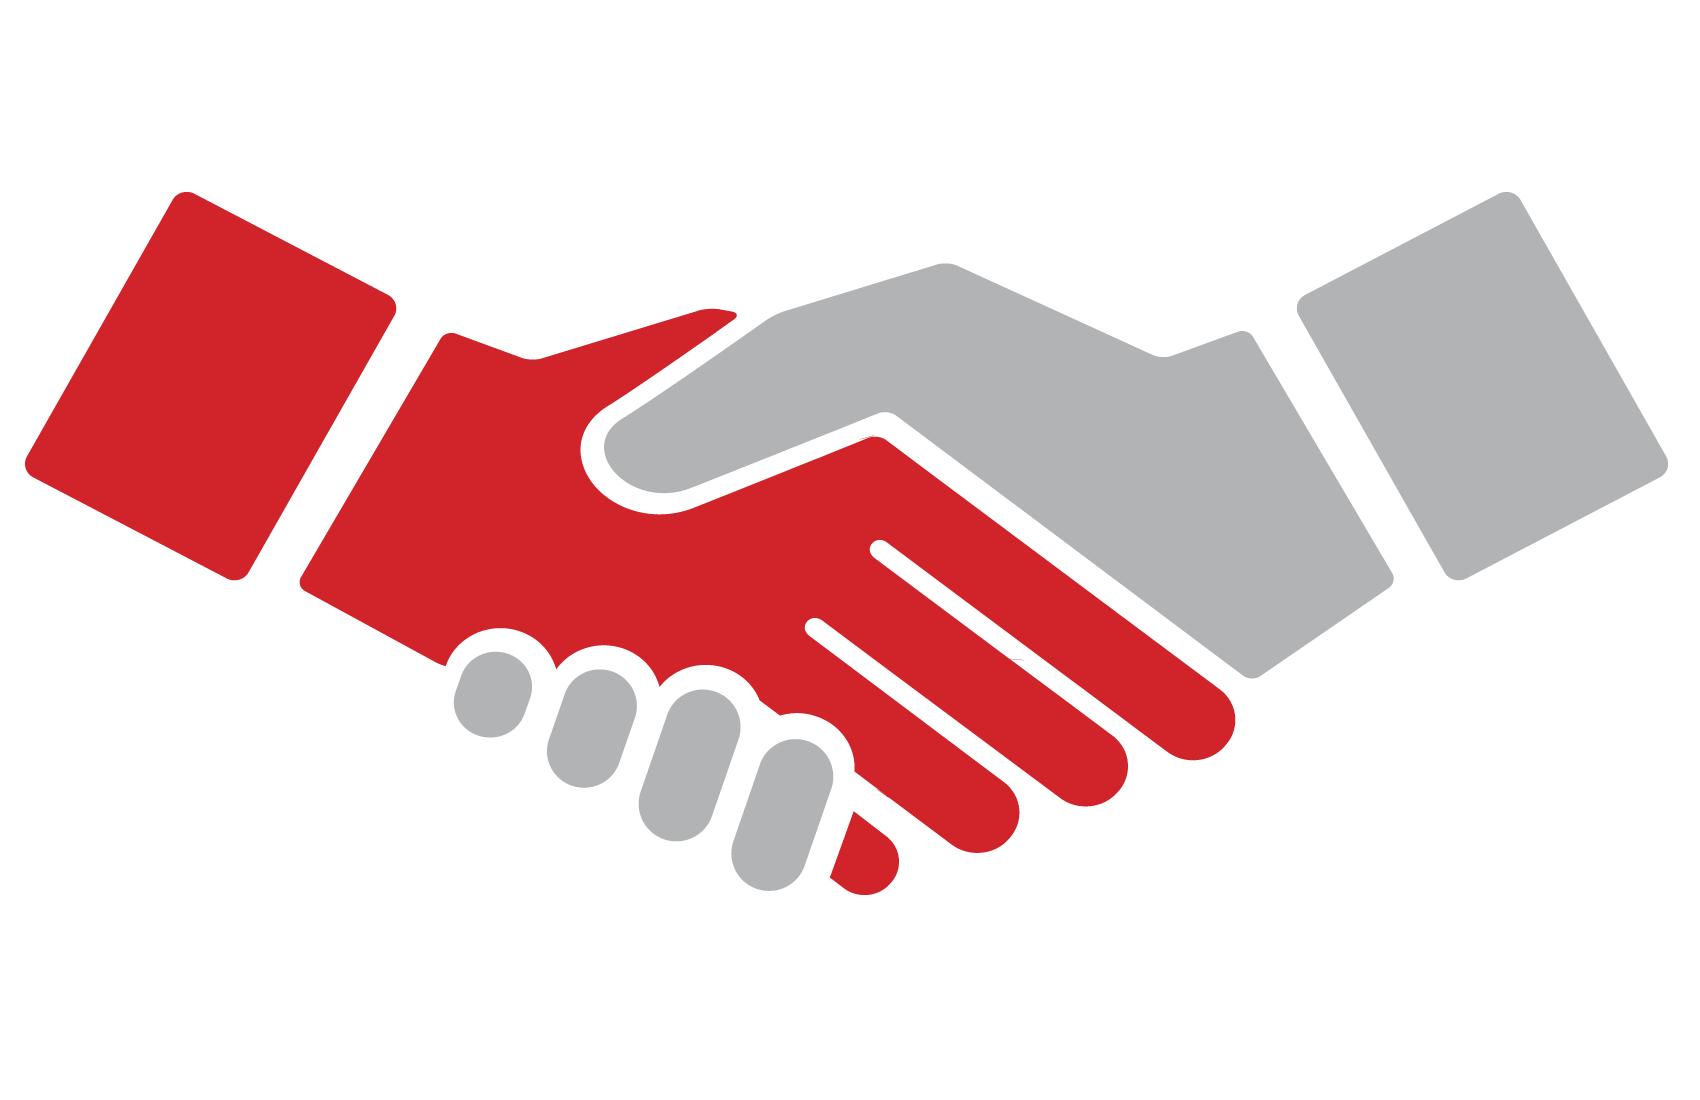 Redi-Rock sales support